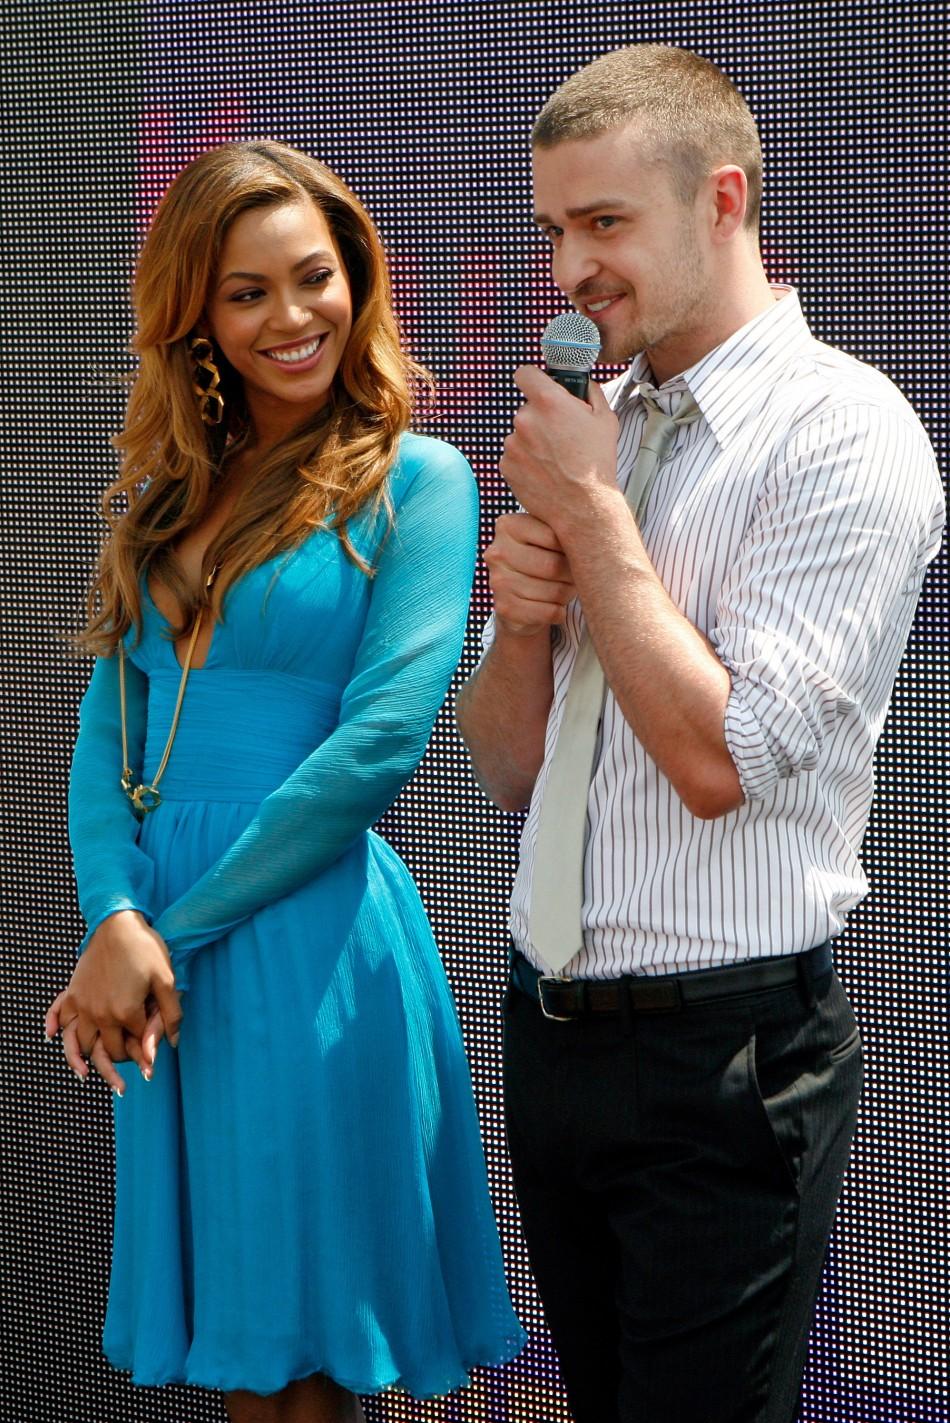 Beyonce Knowles and Justin Timberlake